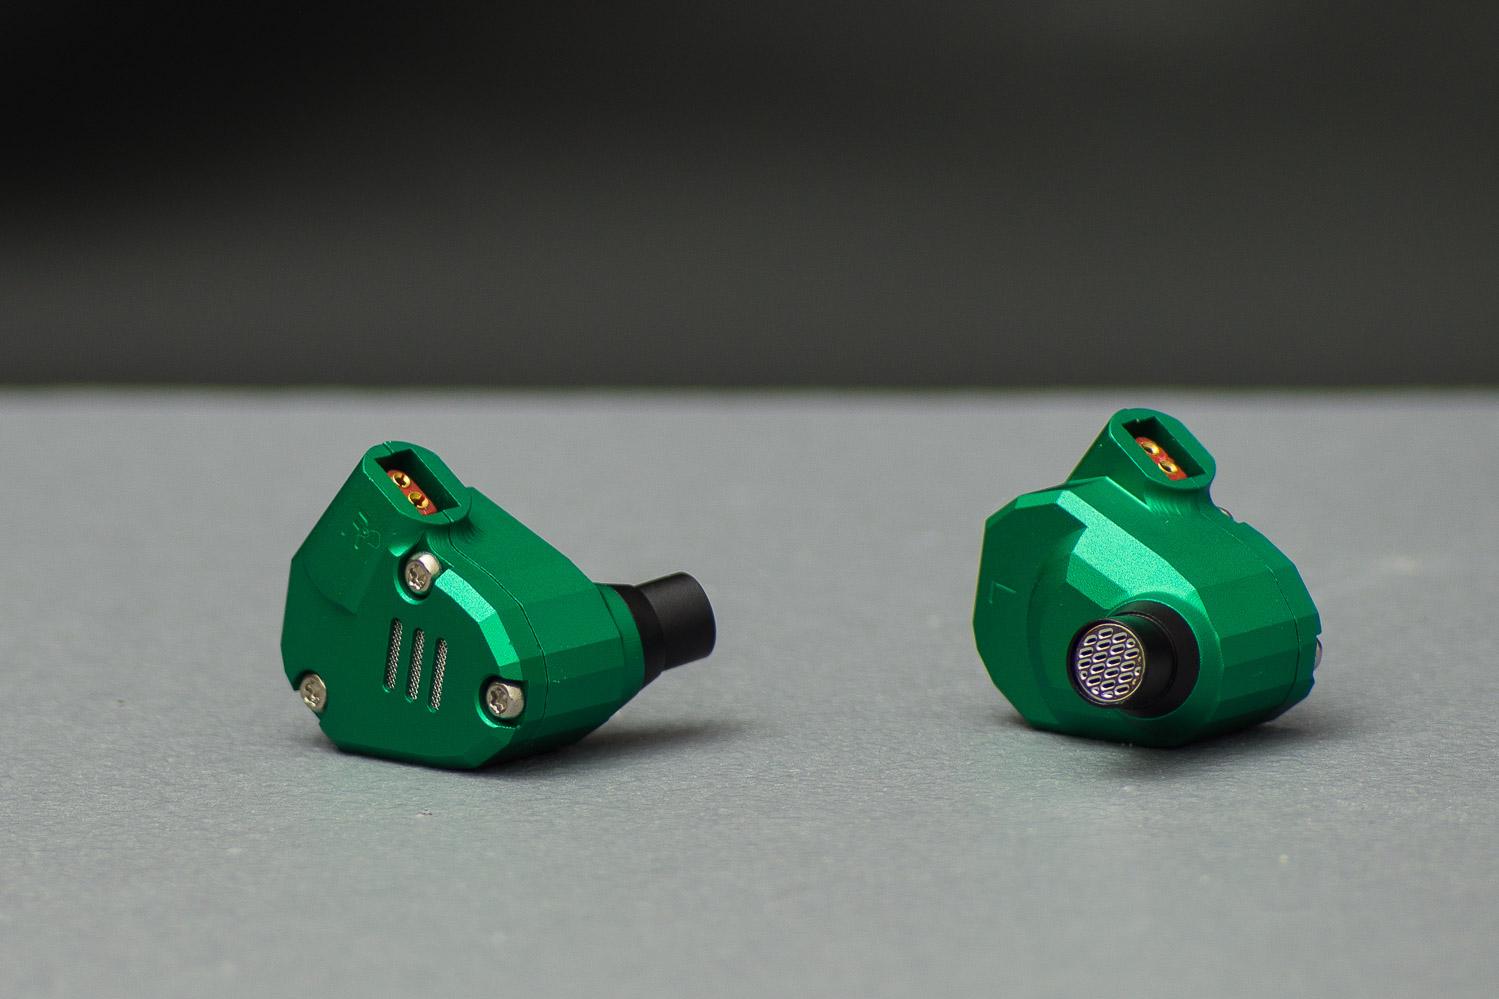 DSC04451-small.JPG